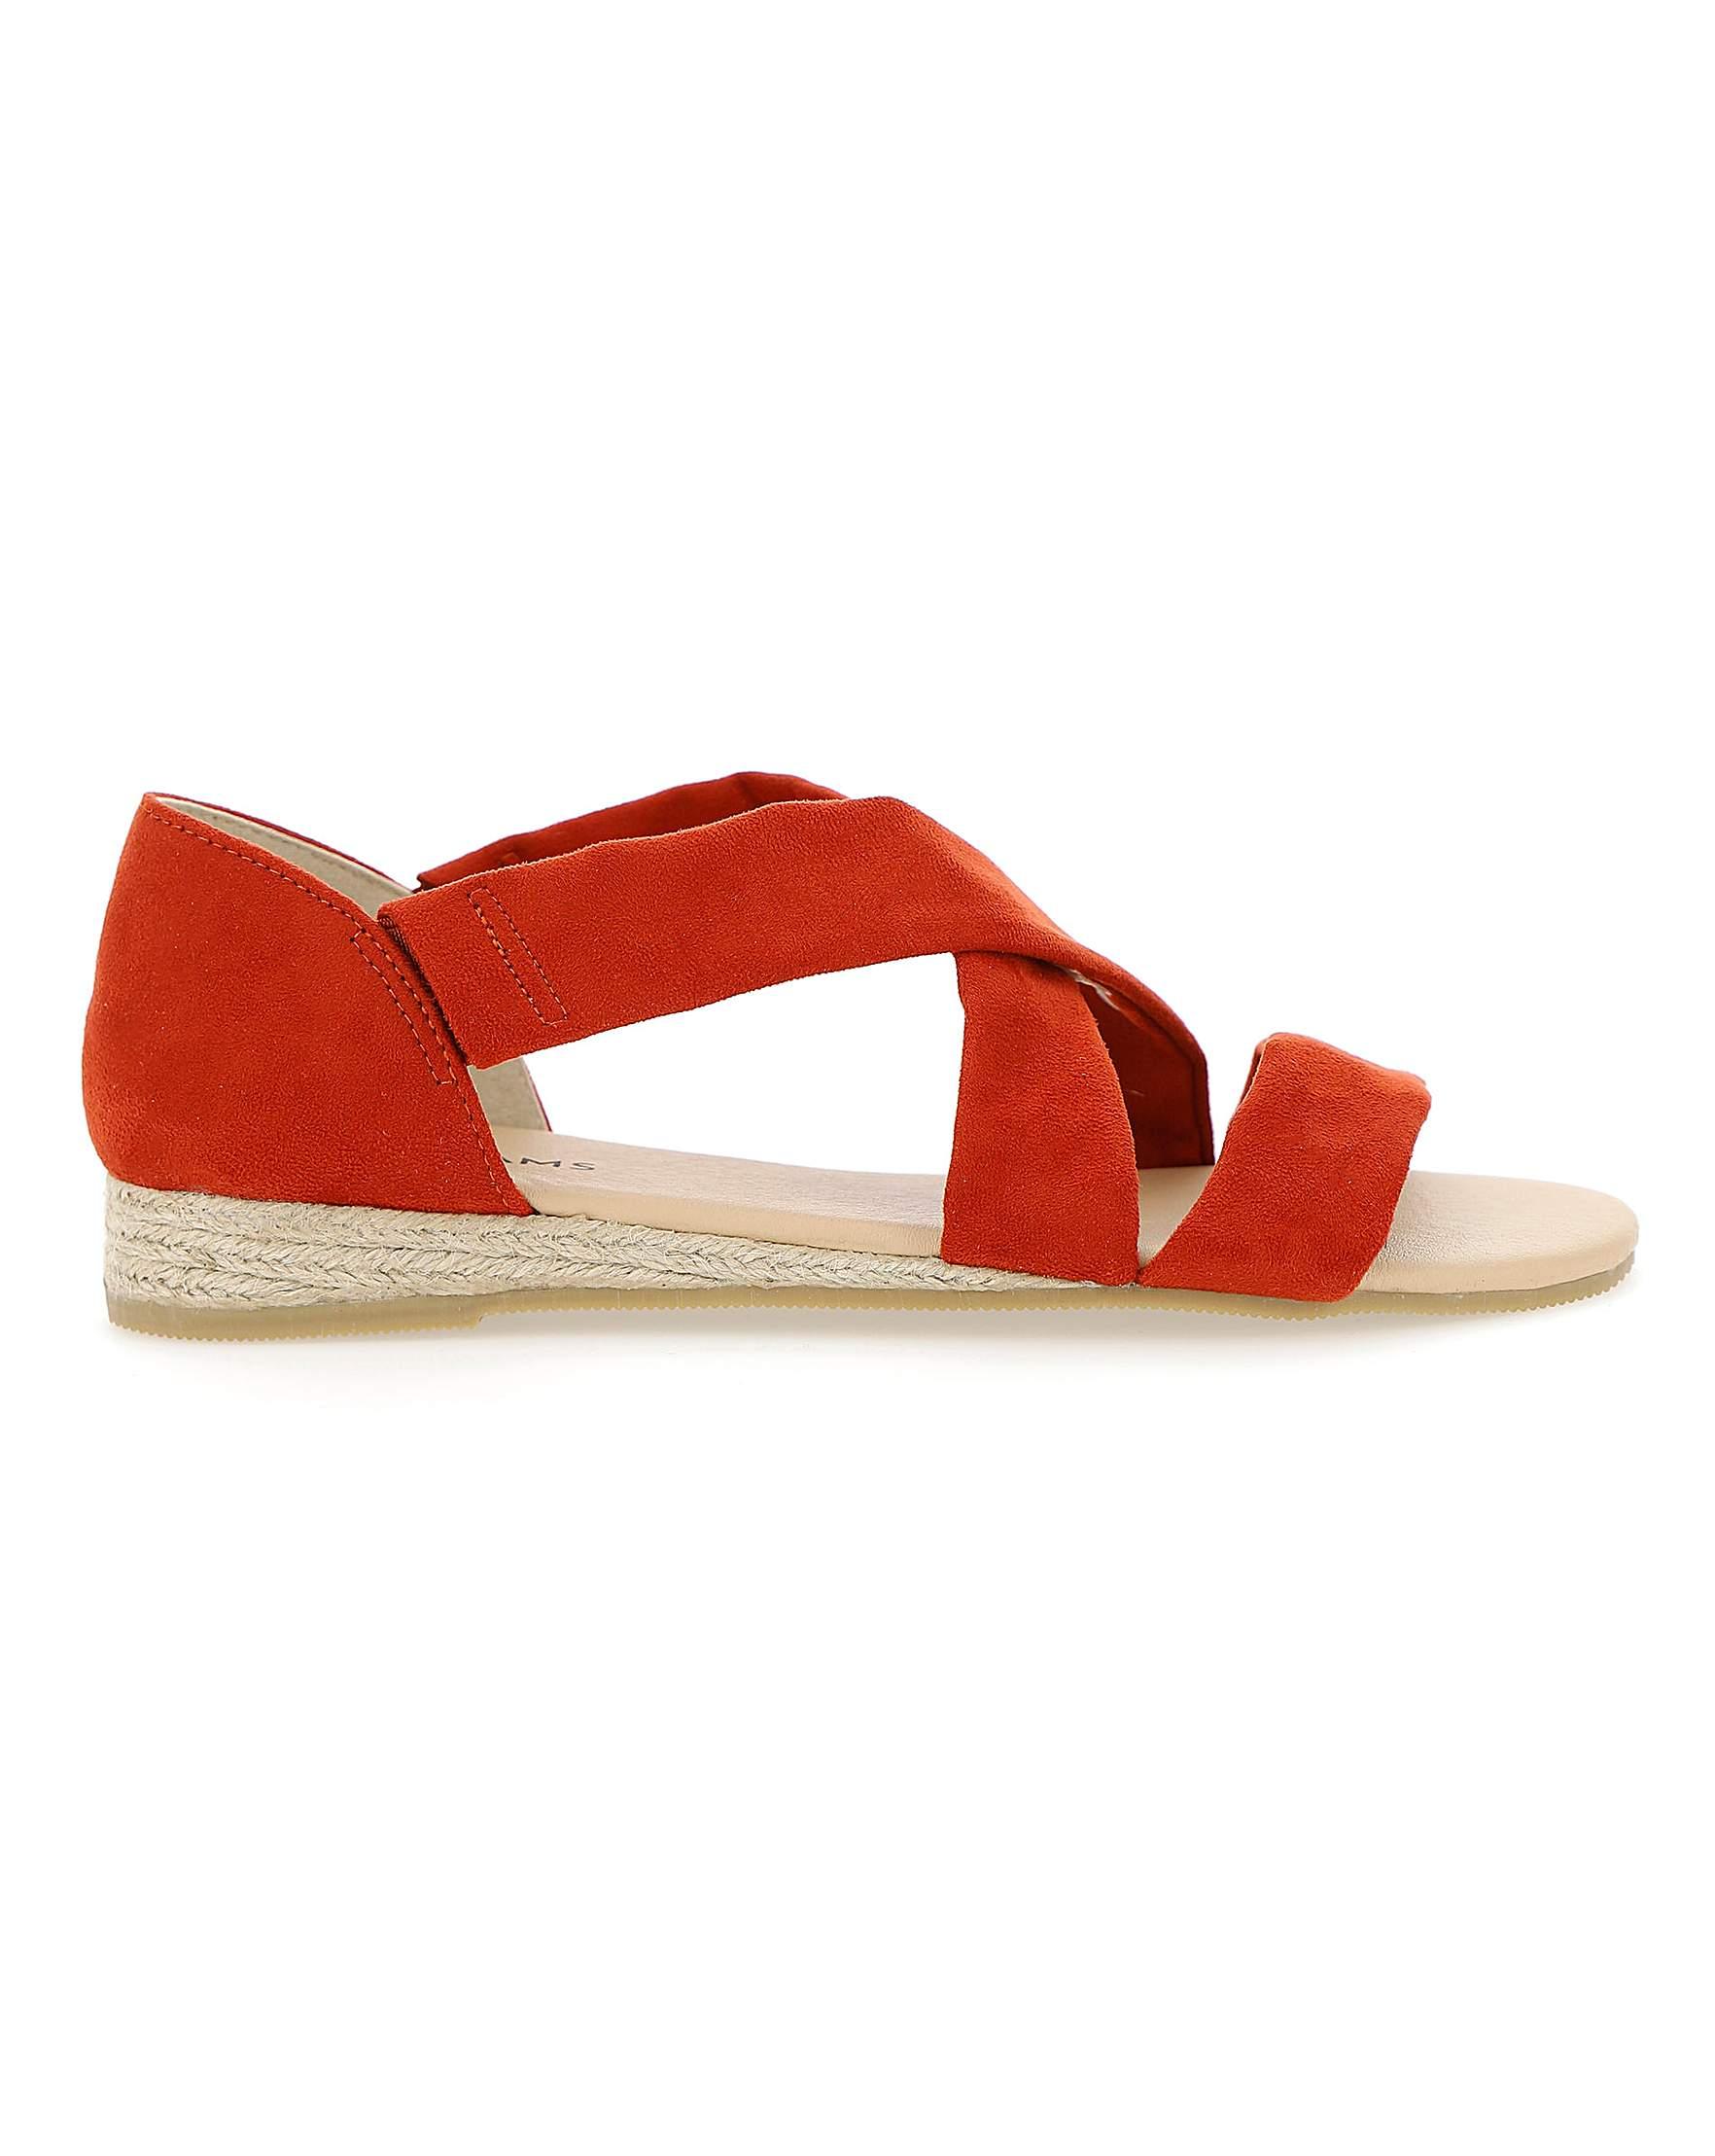 8061d019018 Soft Strap Espadrille Sandals EEE Fit